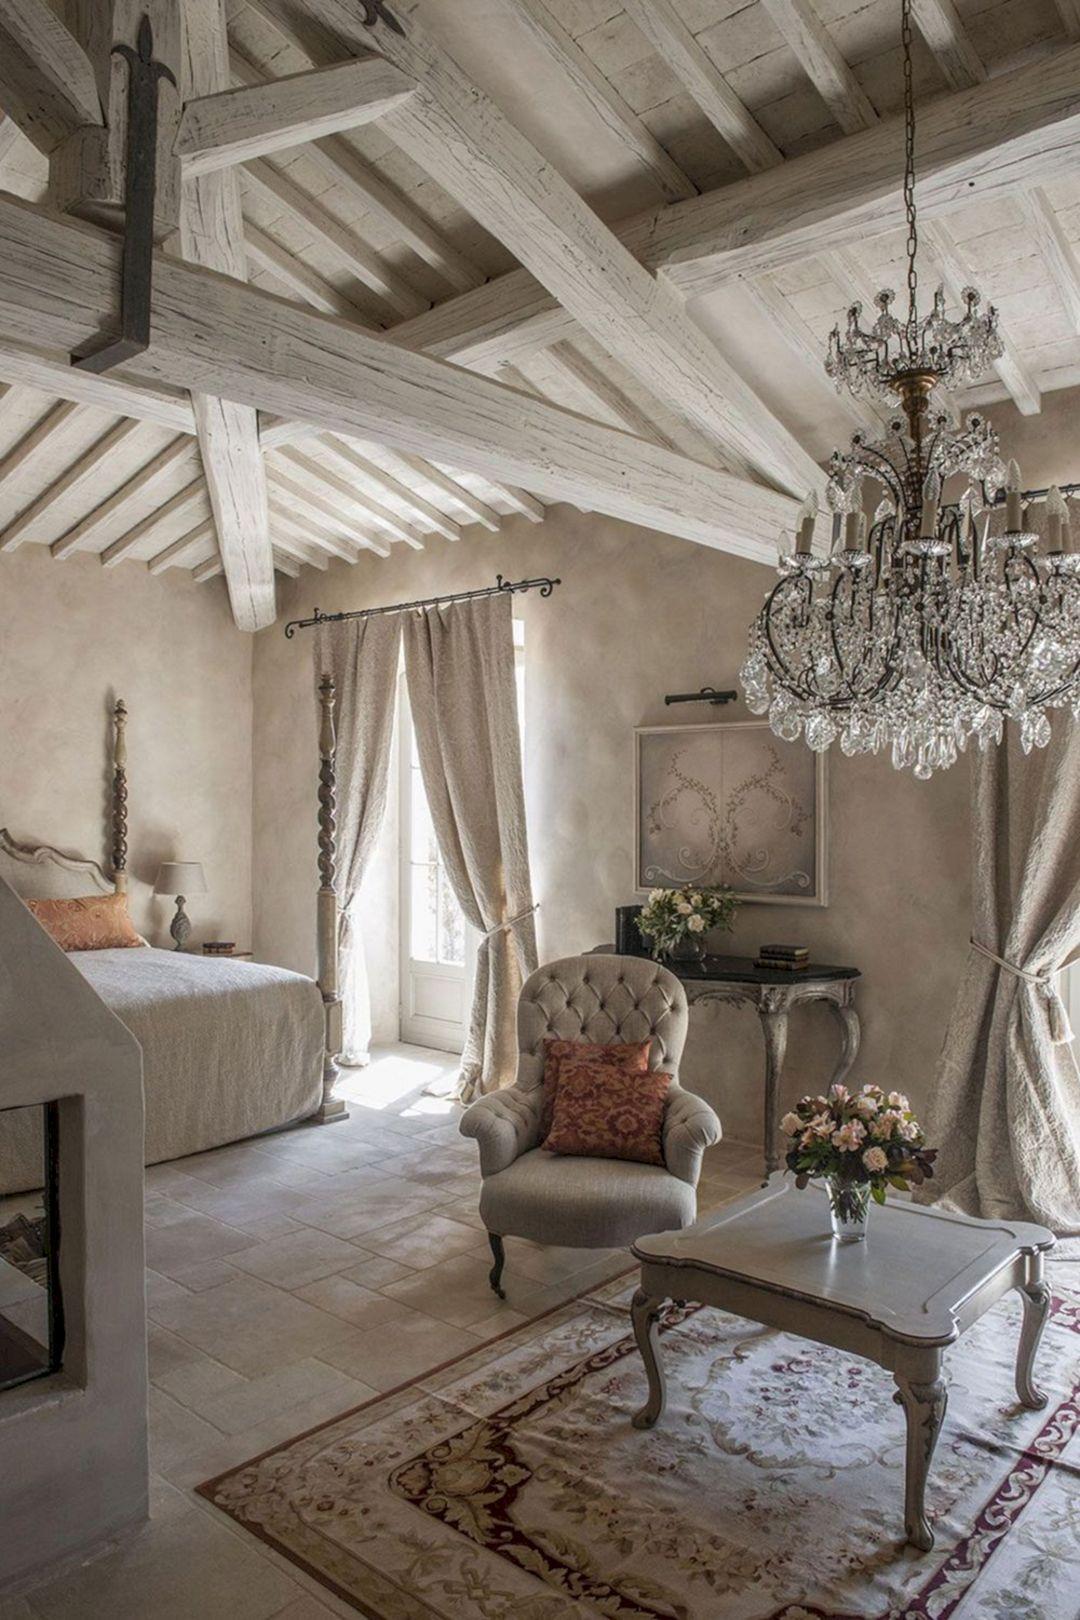 8 Stunning Magnolia Homes Bedroom Design Ideas For